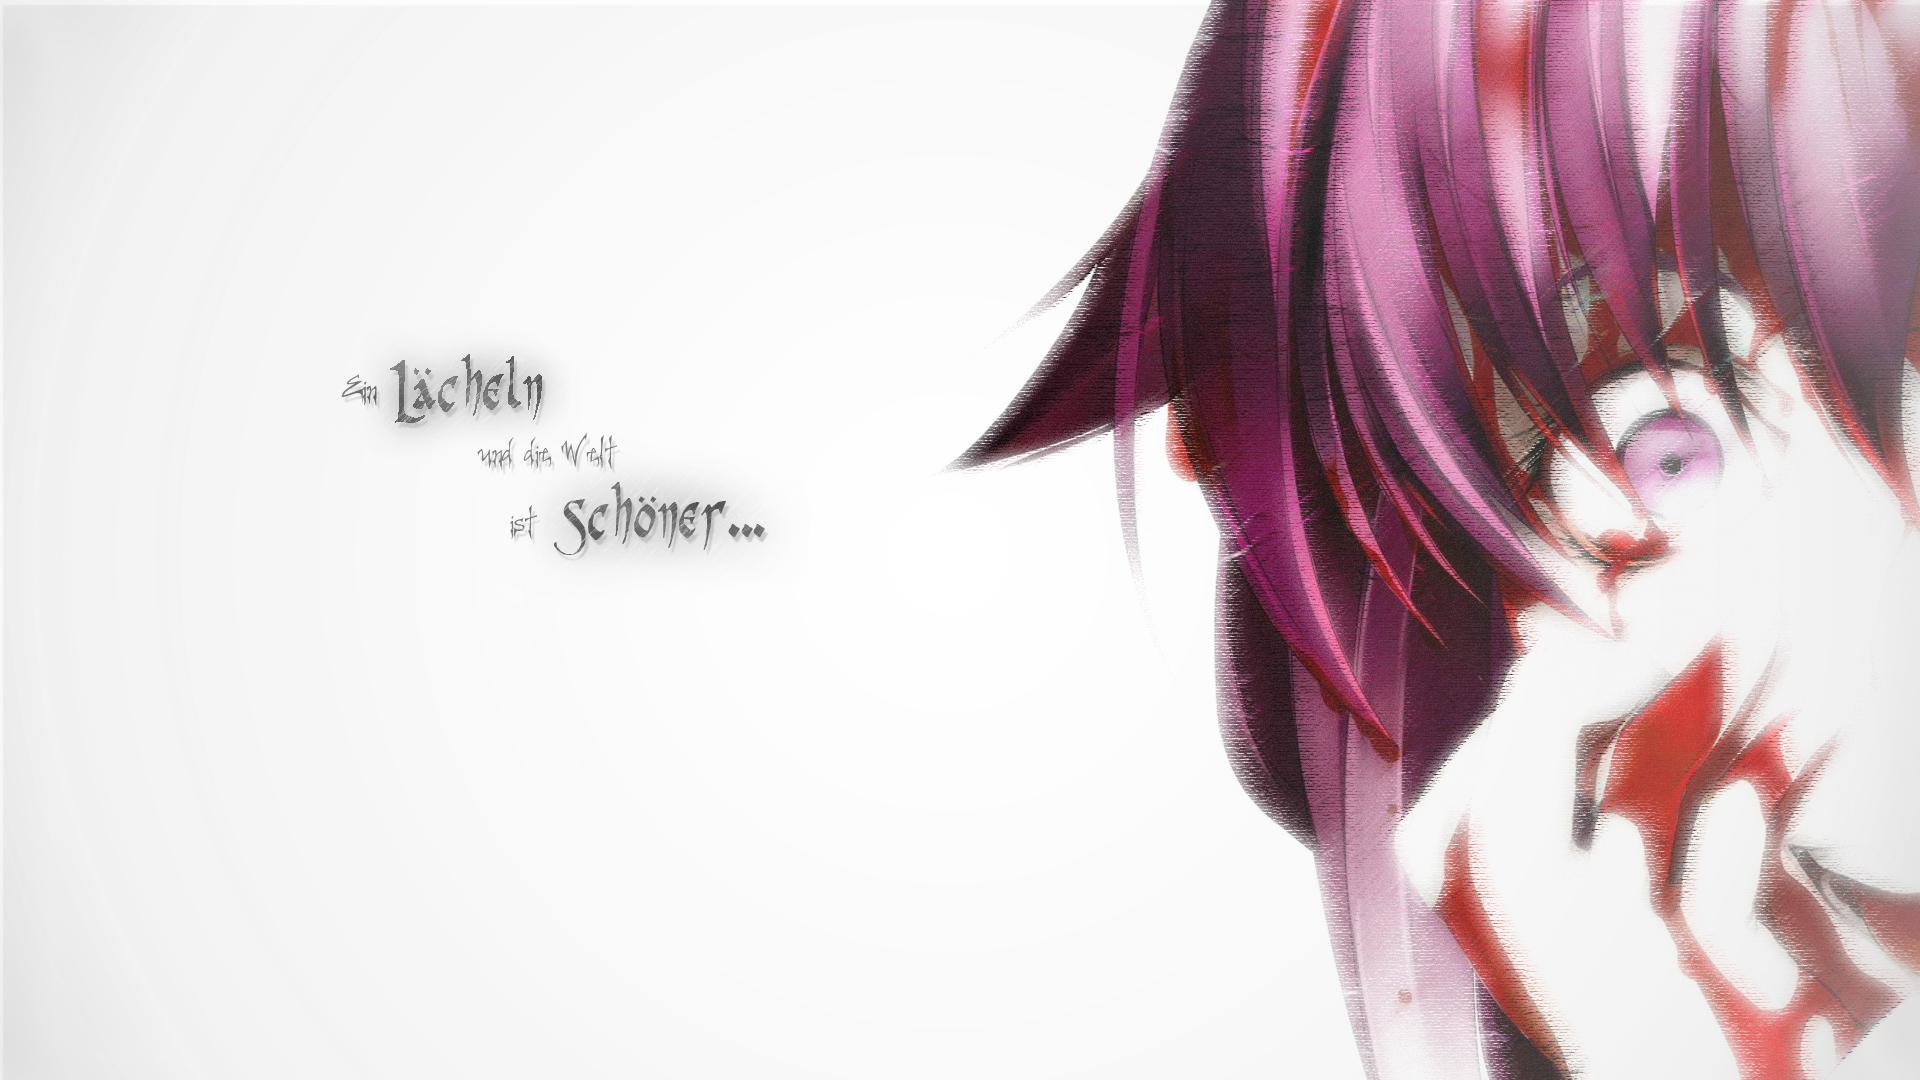 Psycho Yuno Hd Wallpaper Background Image 1920x1080 Id426350